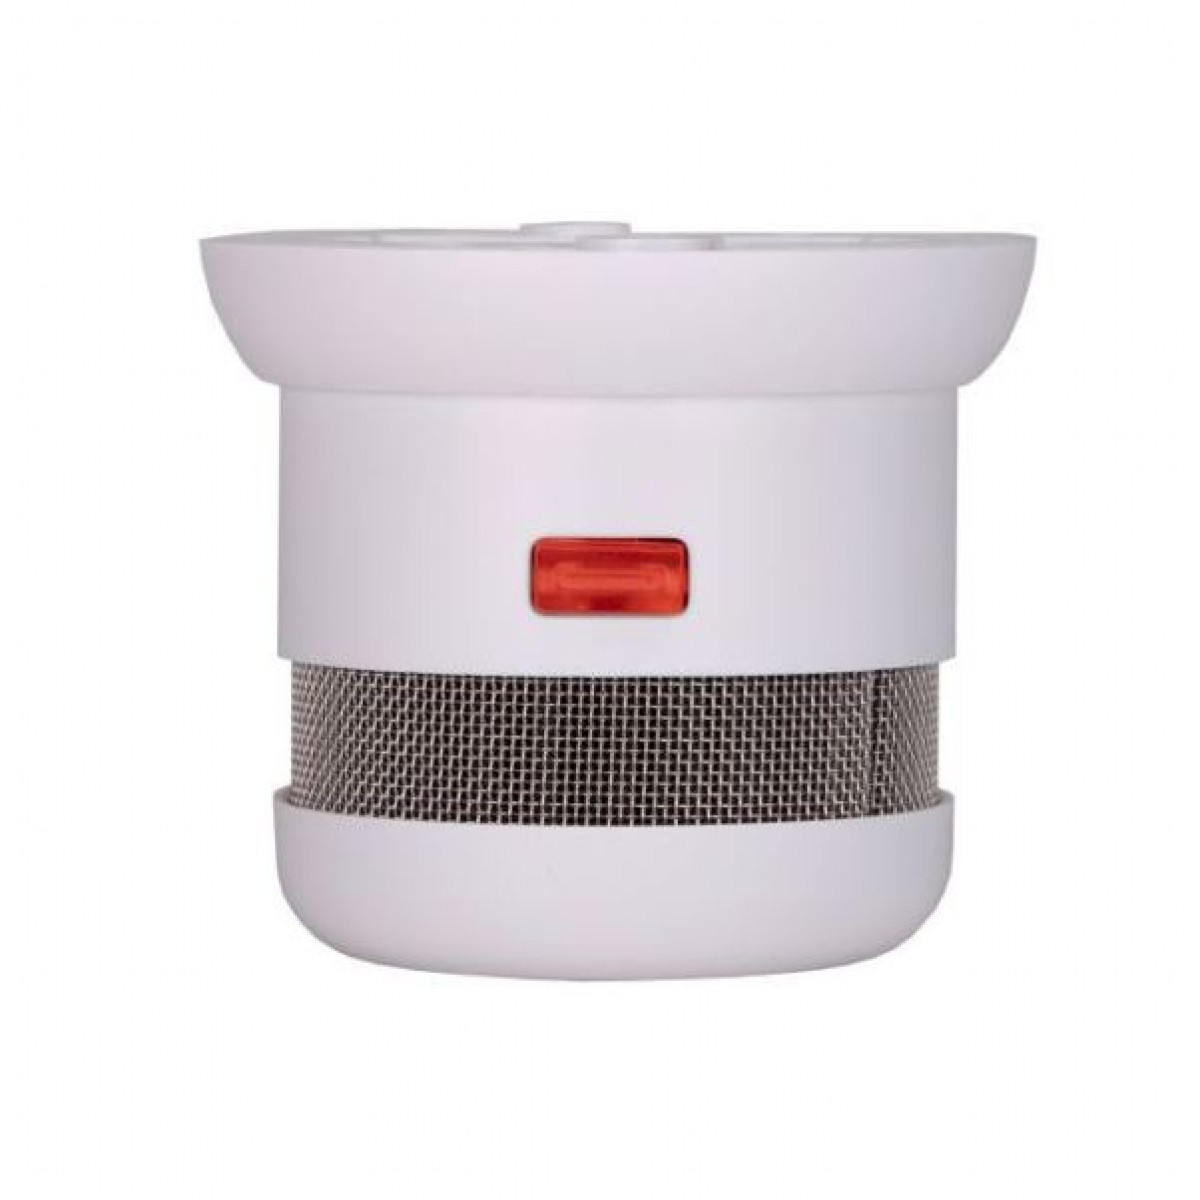 fotoelektrischer mini rauchwarnmelder elektronik f r. Black Bedroom Furniture Sets. Home Design Ideas